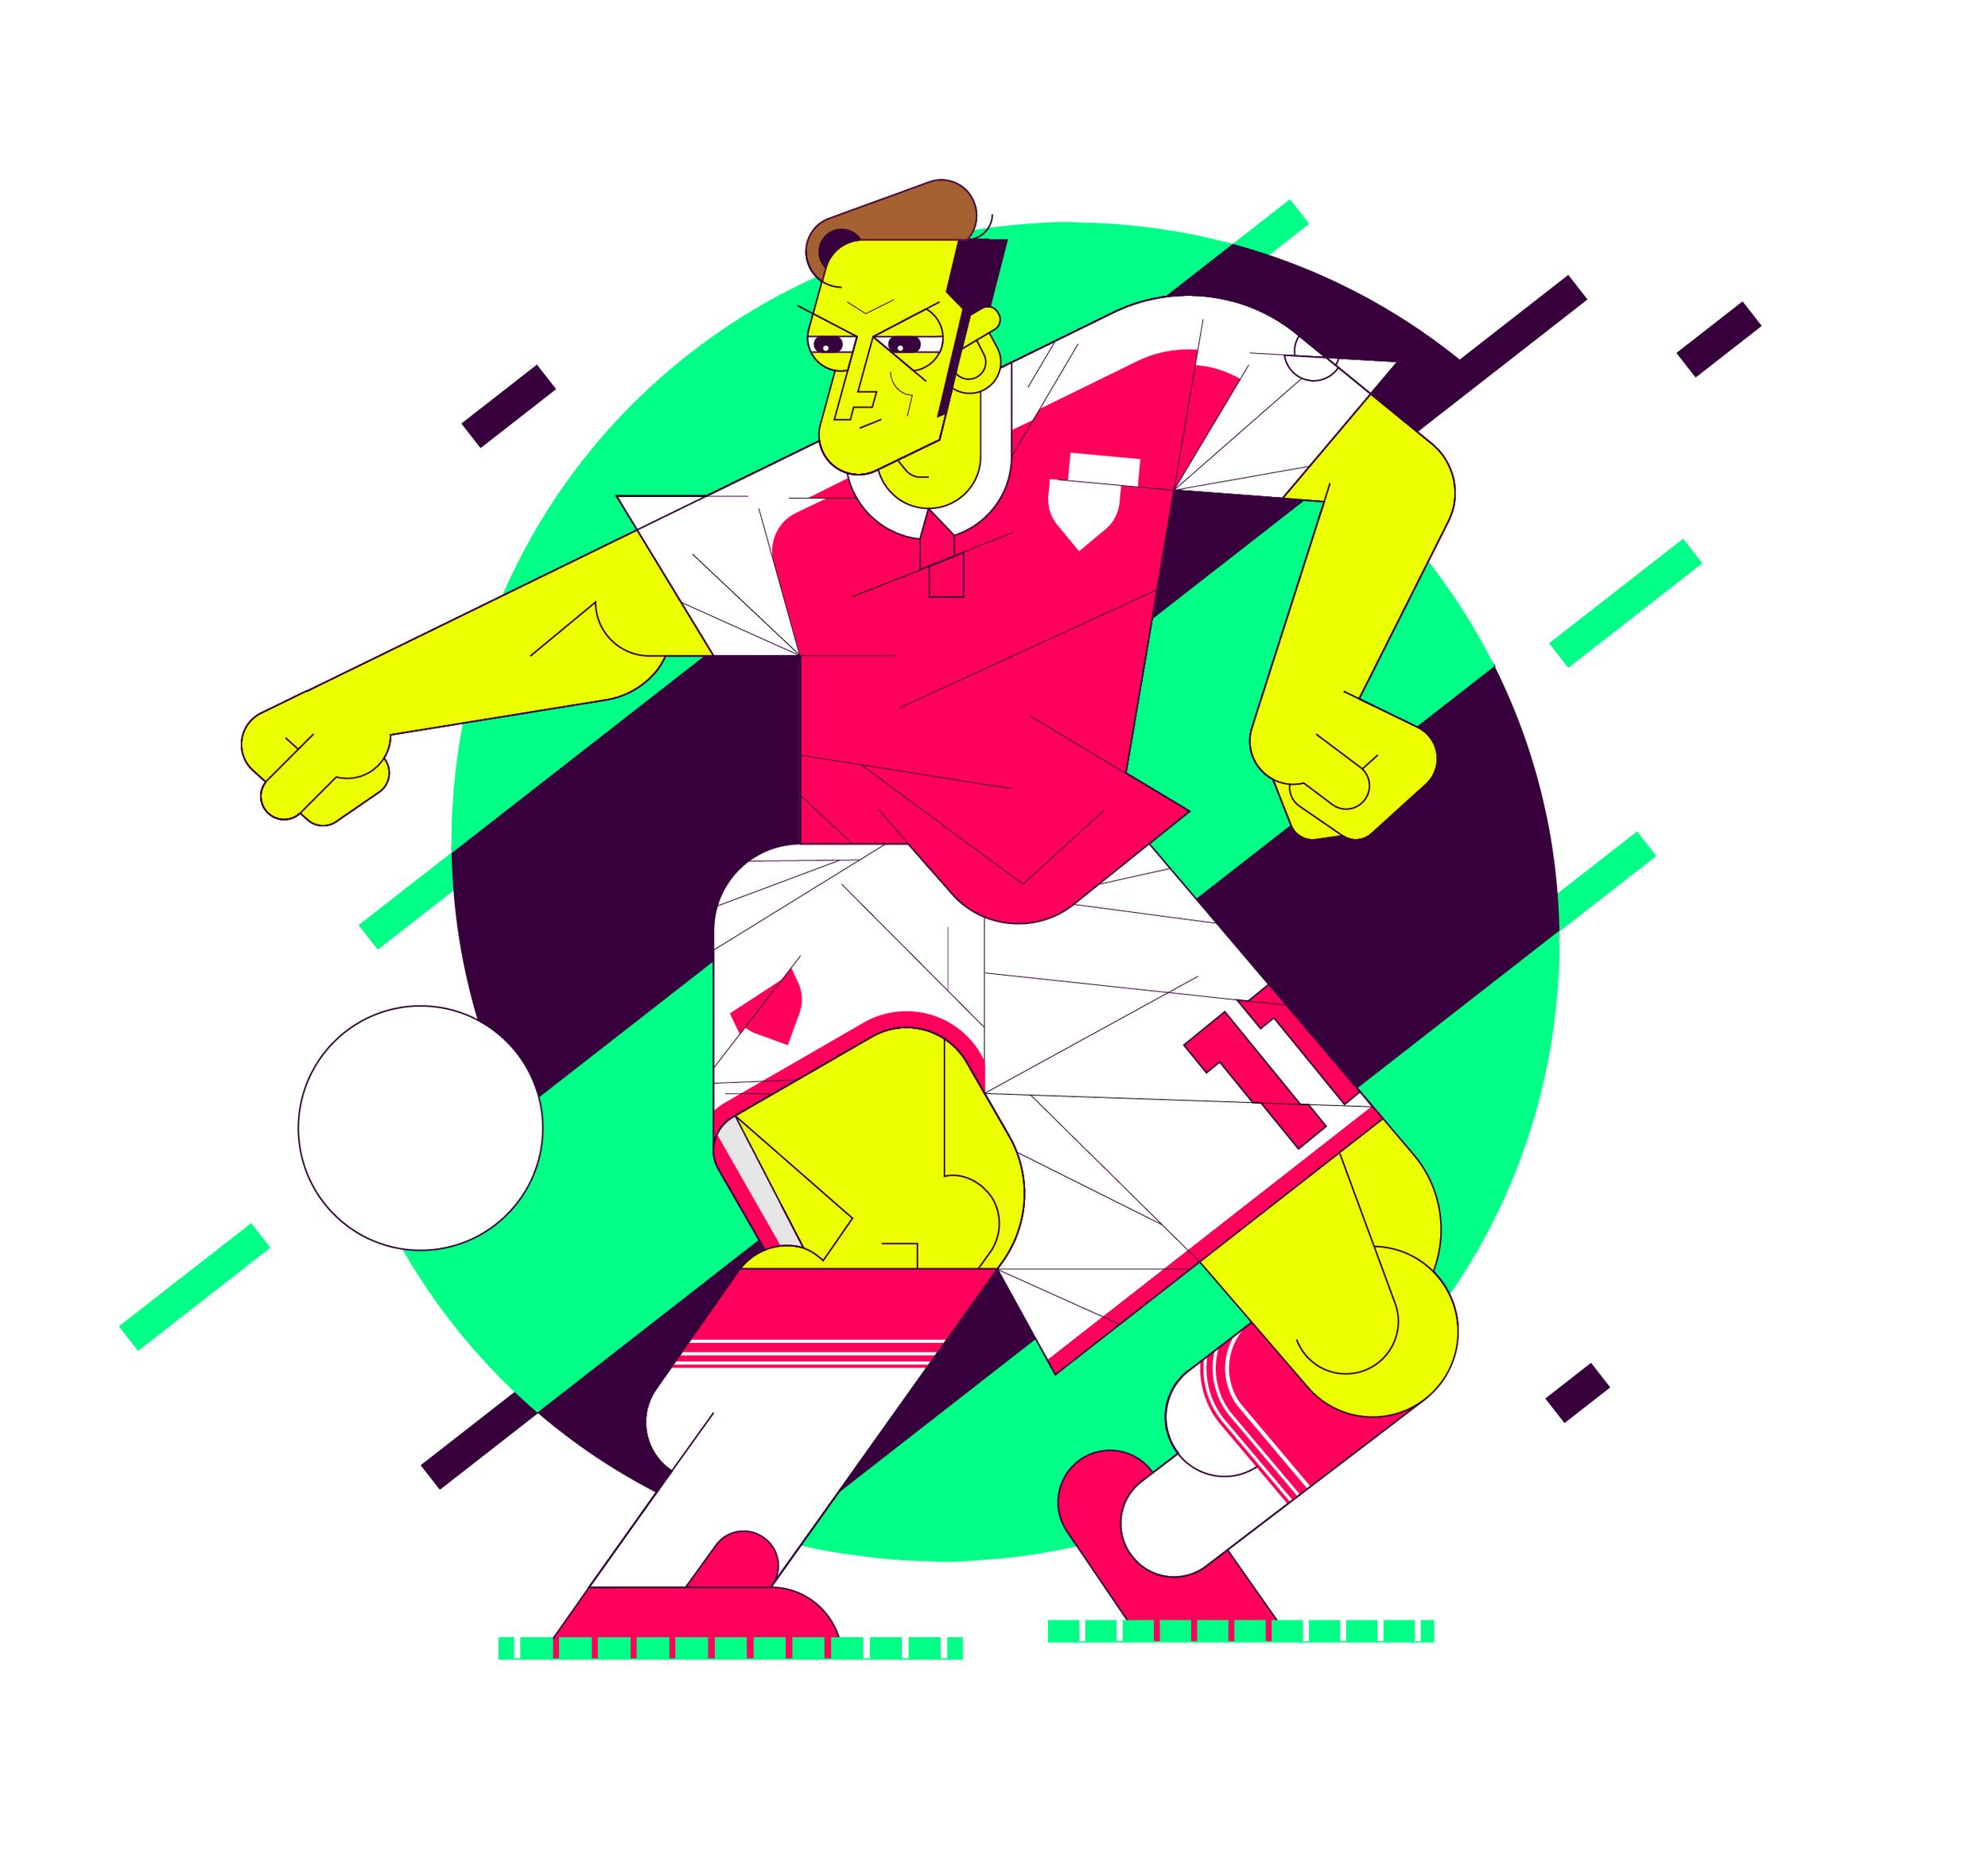 Football Players_Mesut Özil studies_final.png